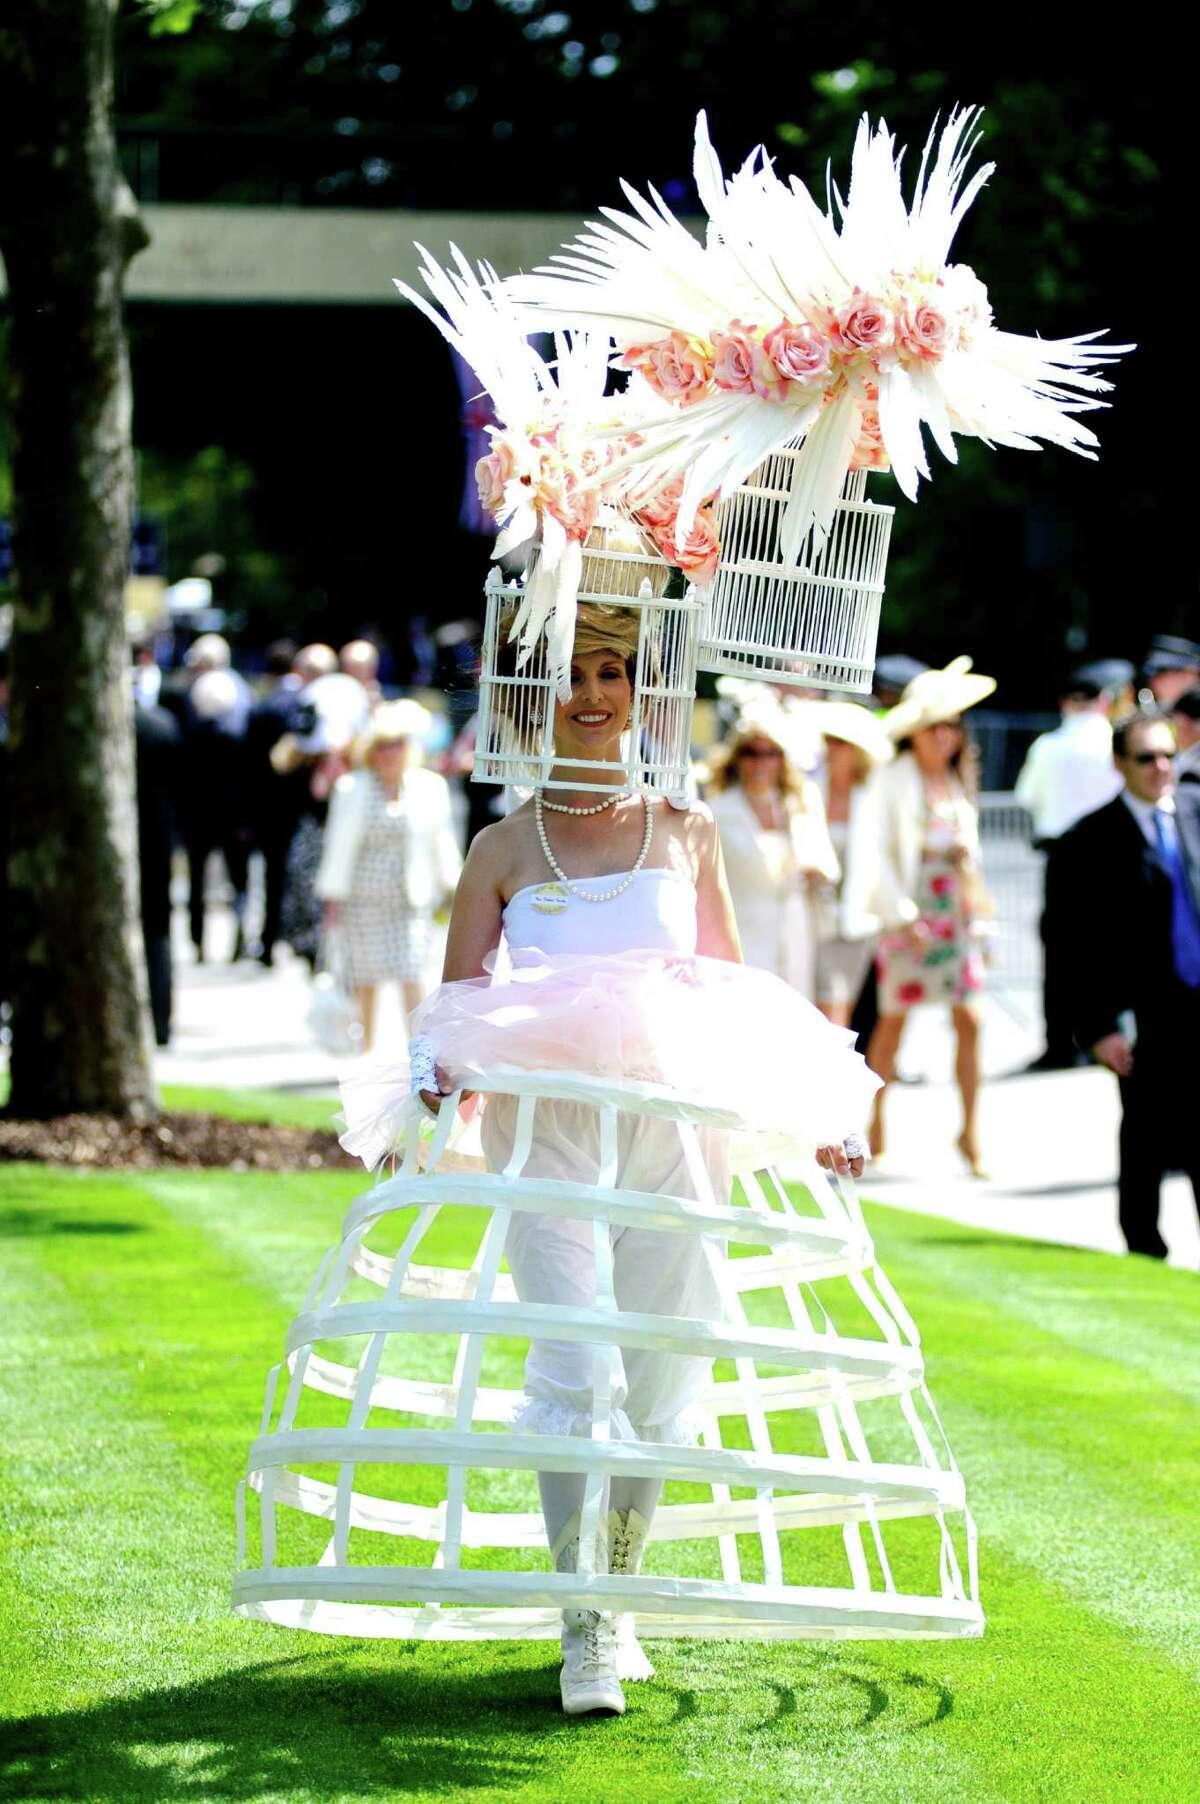 ASCOT, ENGLAND - JUNE 19: Racegoers attend day 1 of Royal Ascot at Ascot Racecourse on June 19, 2012 in Ascot, England.